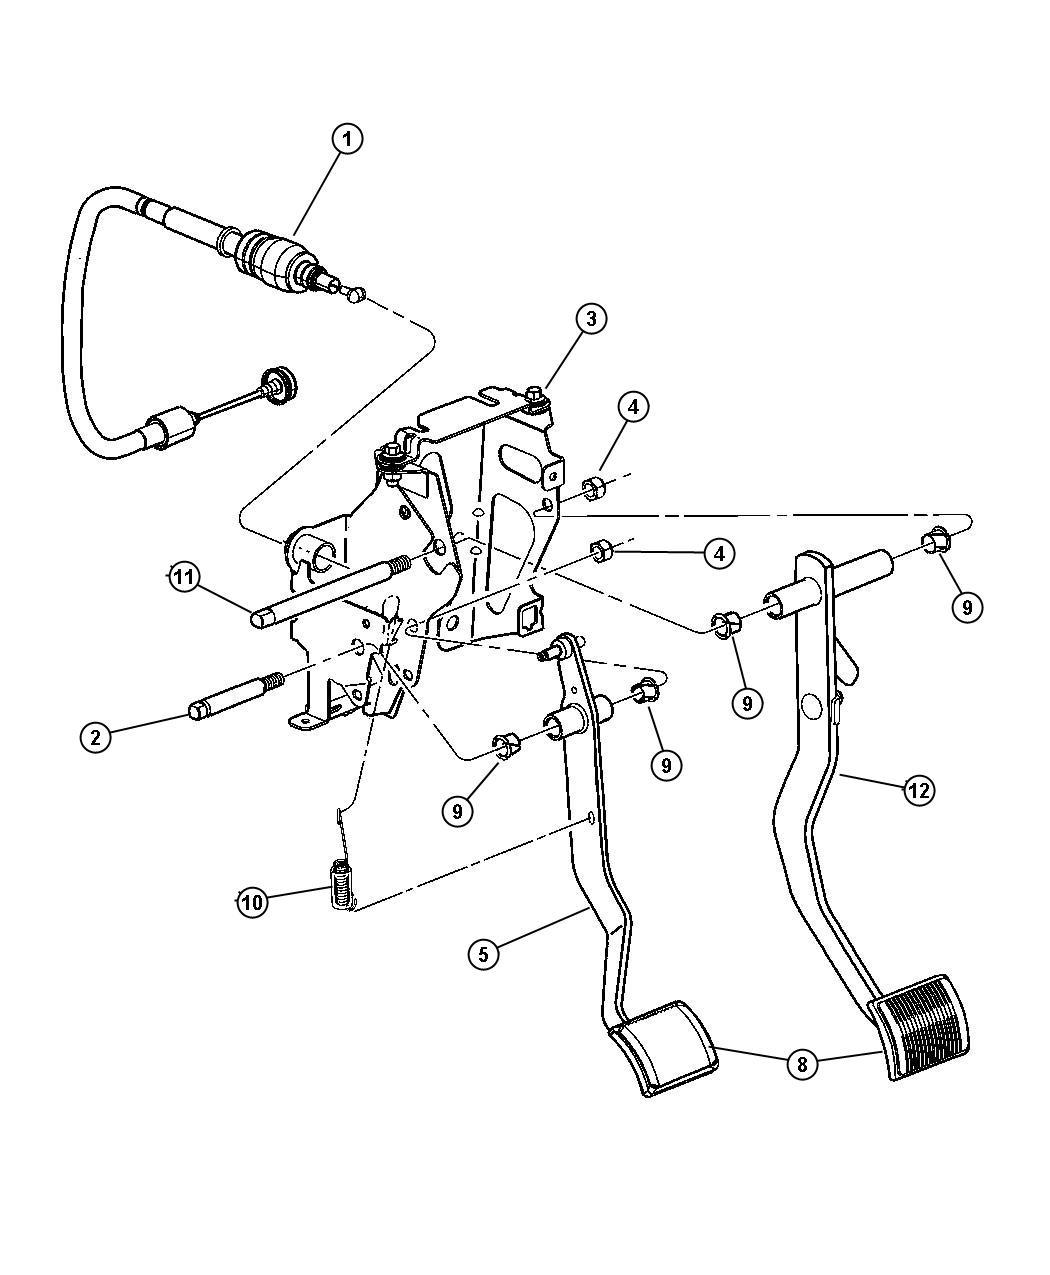 Chrysler Sebring Bracket Used For Clutch And Brake Pedal